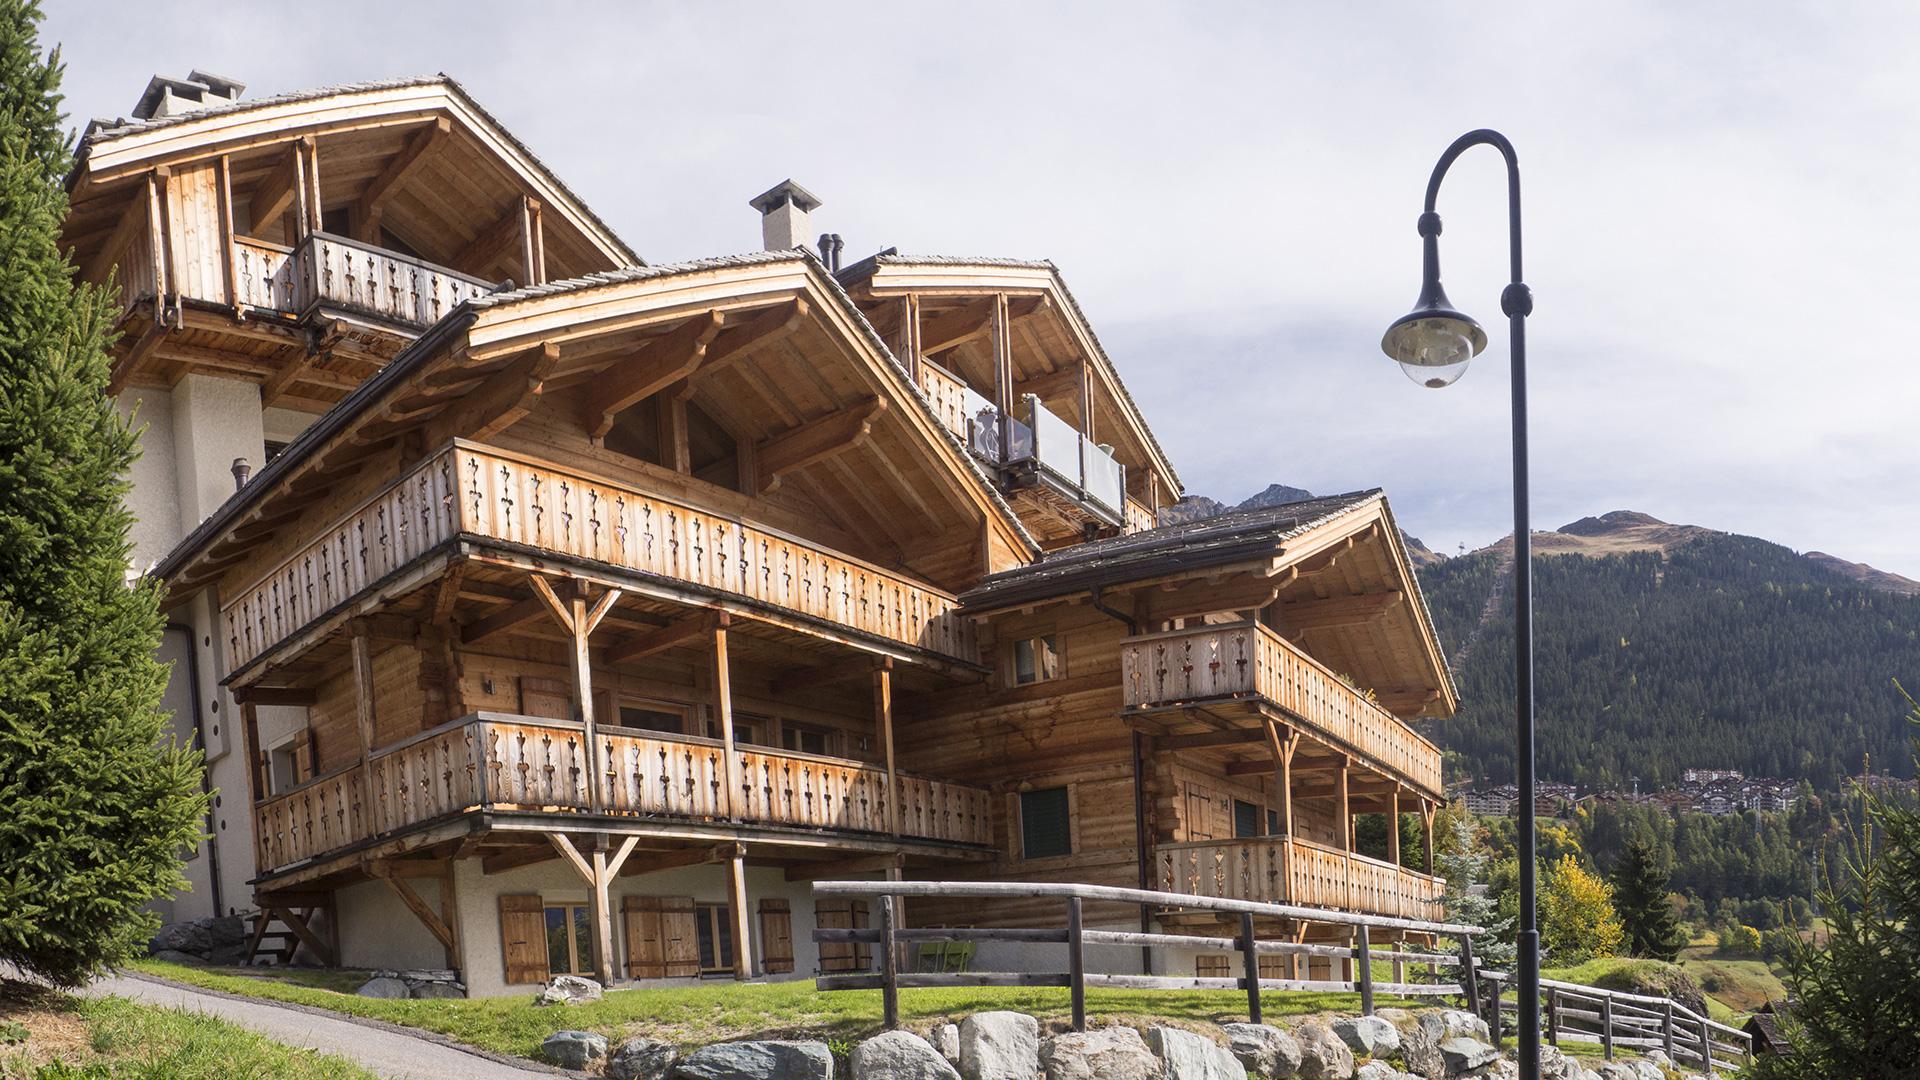 Solives 301 Apartments, Switzerland